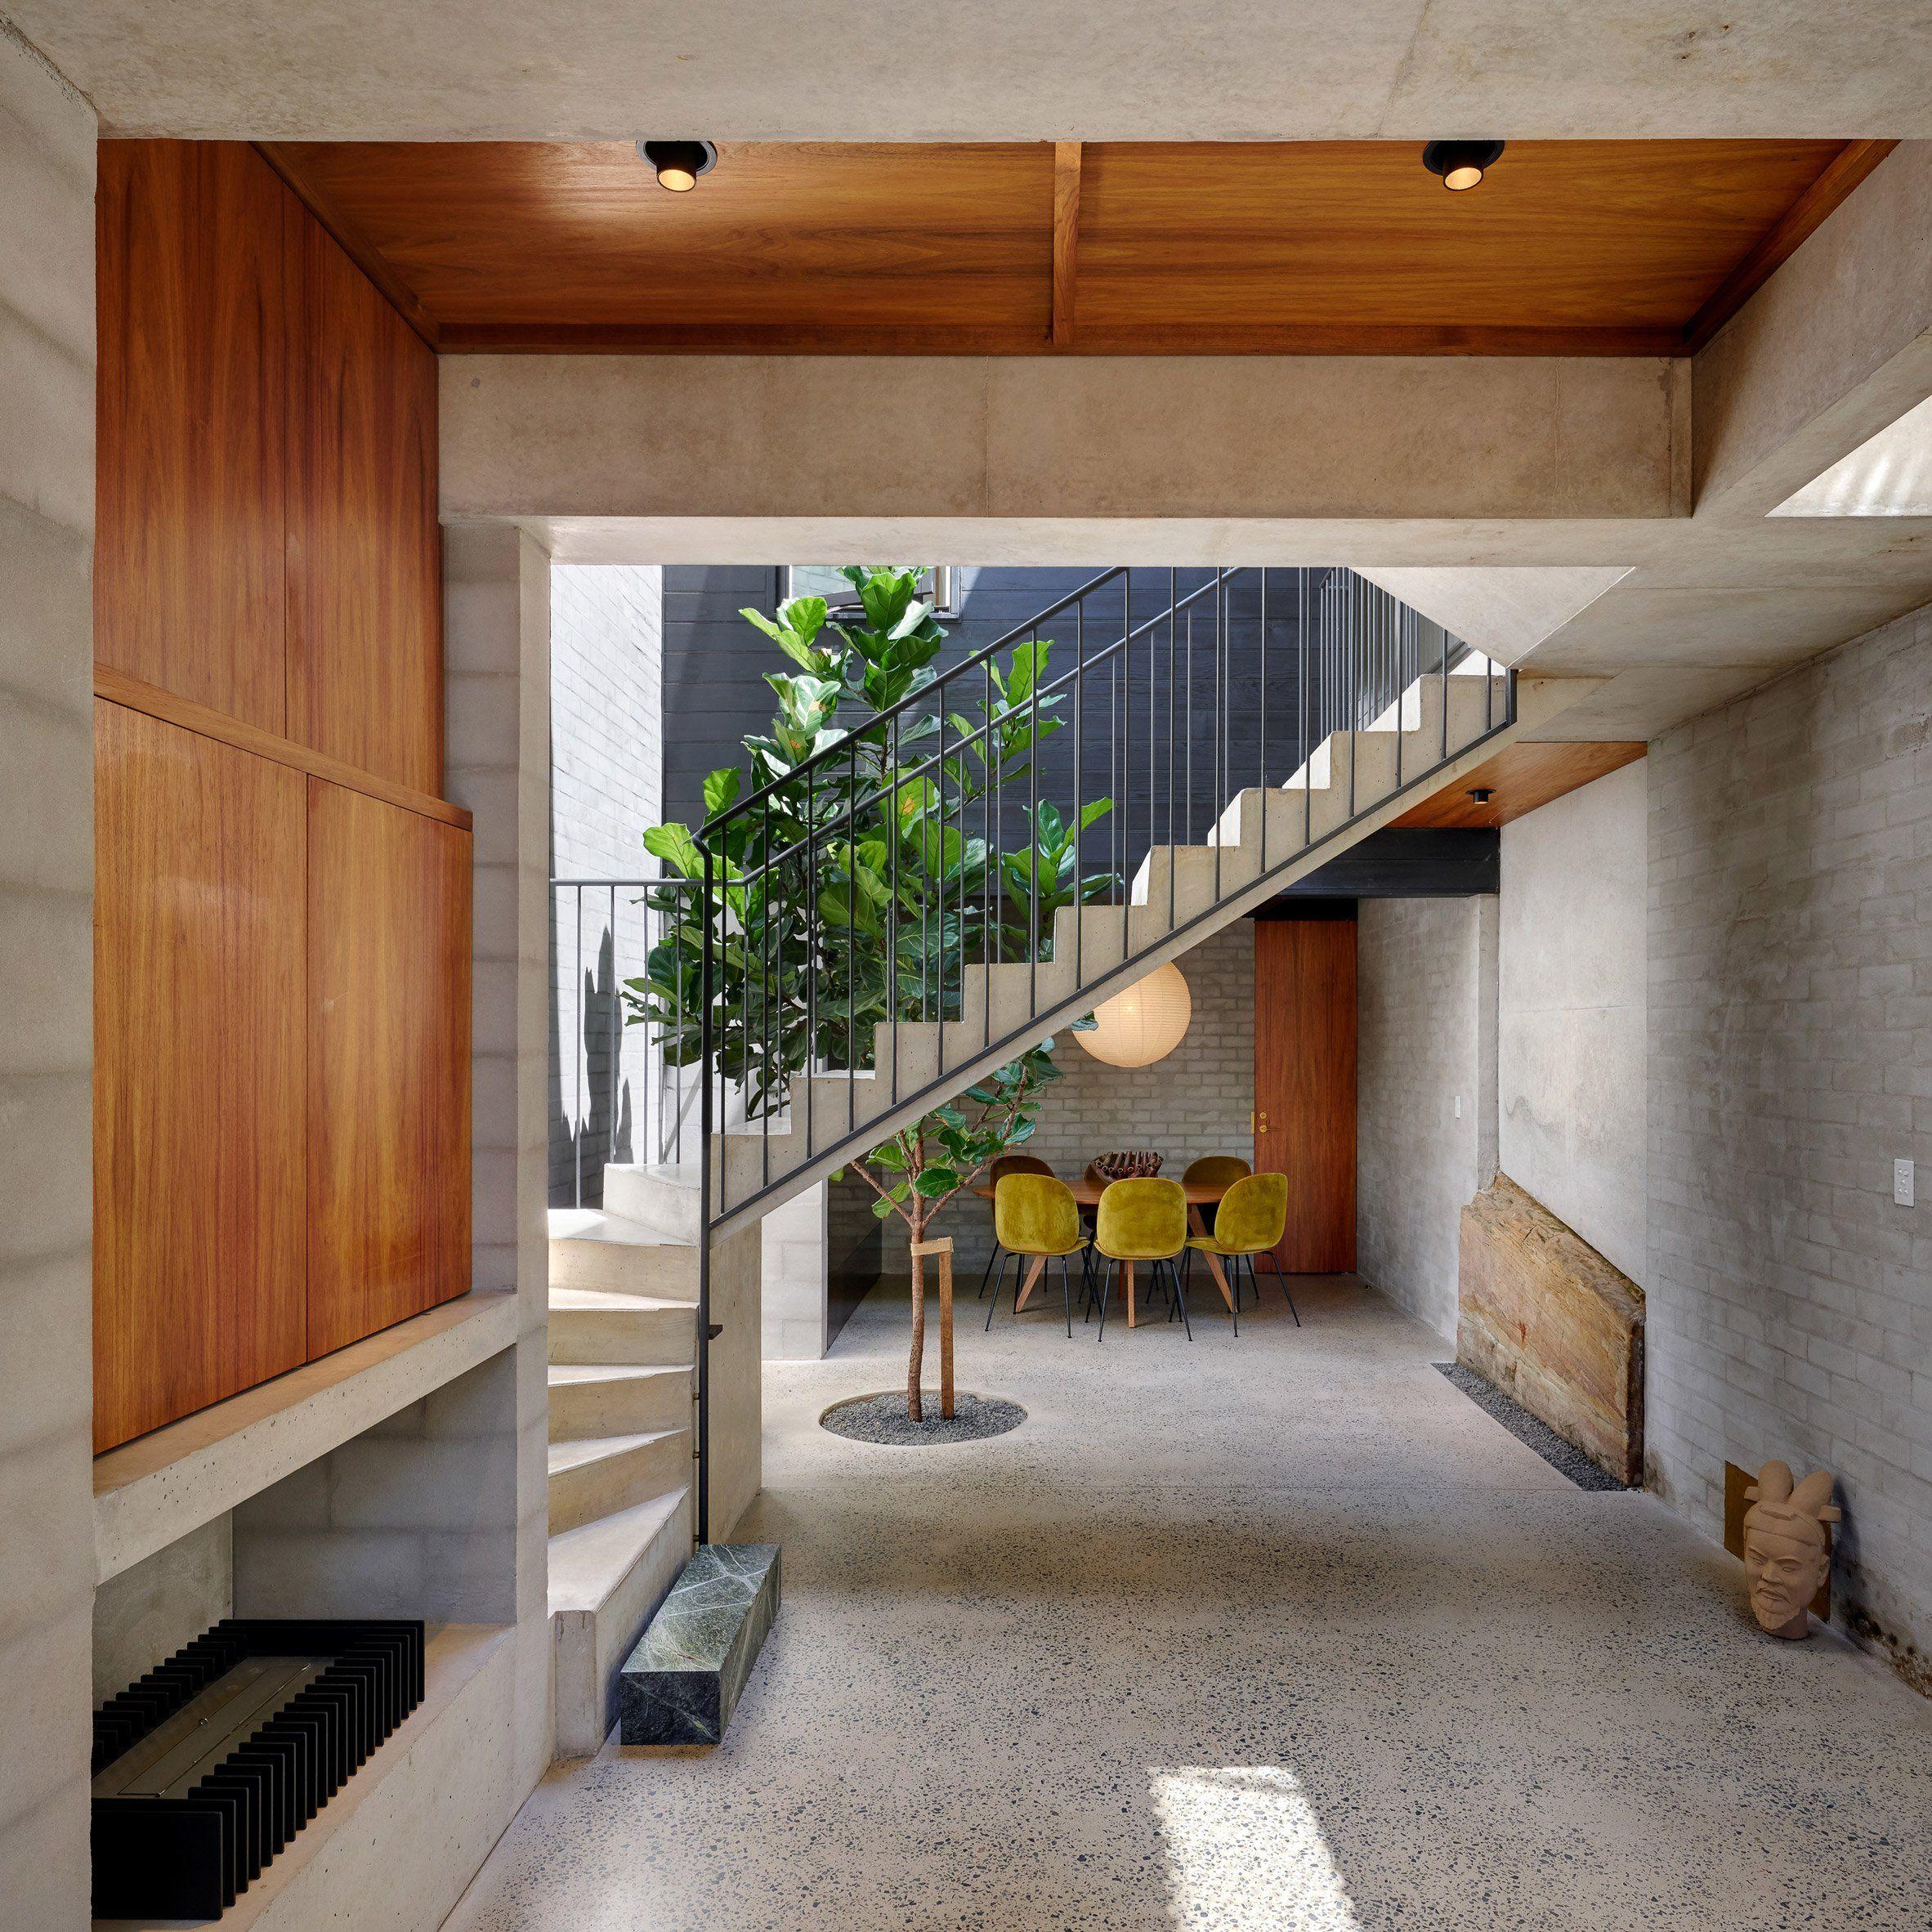 A Tree Grows Up The Lightwell That Australian Studio Welsh